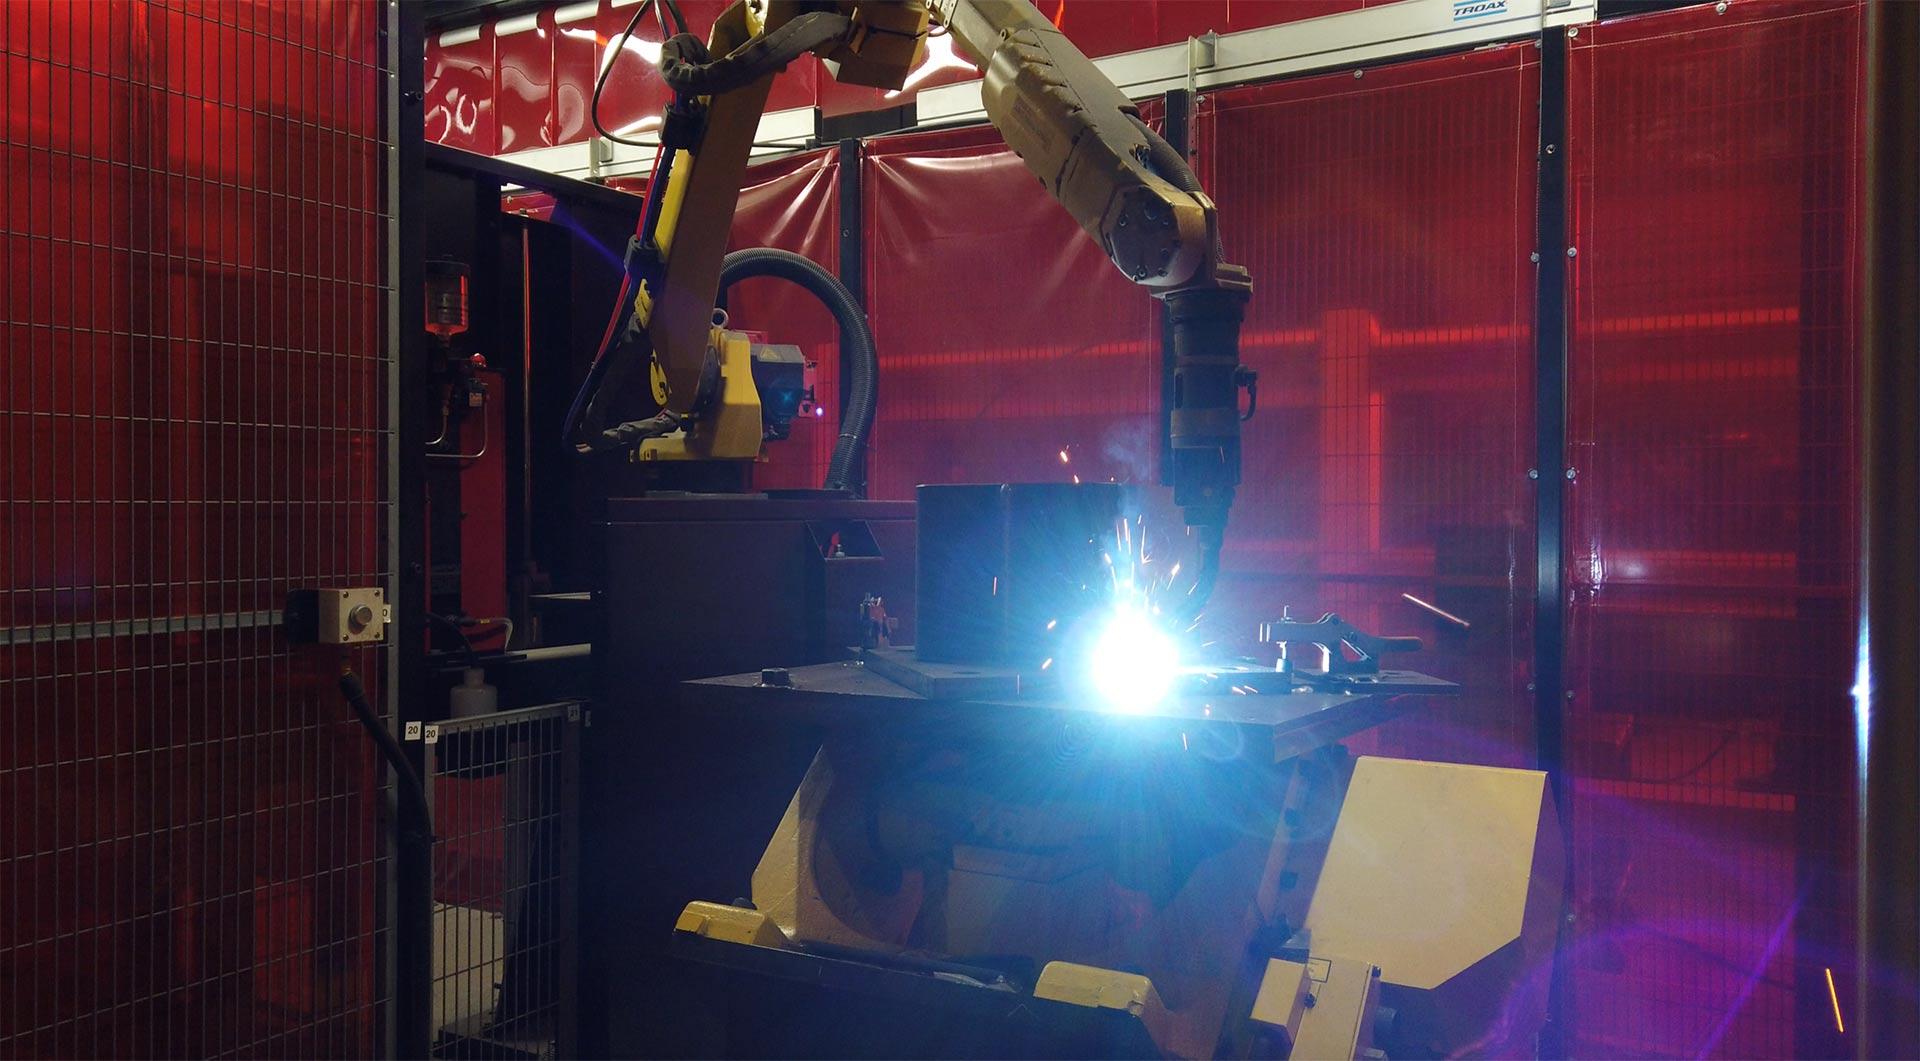 Robot welding station